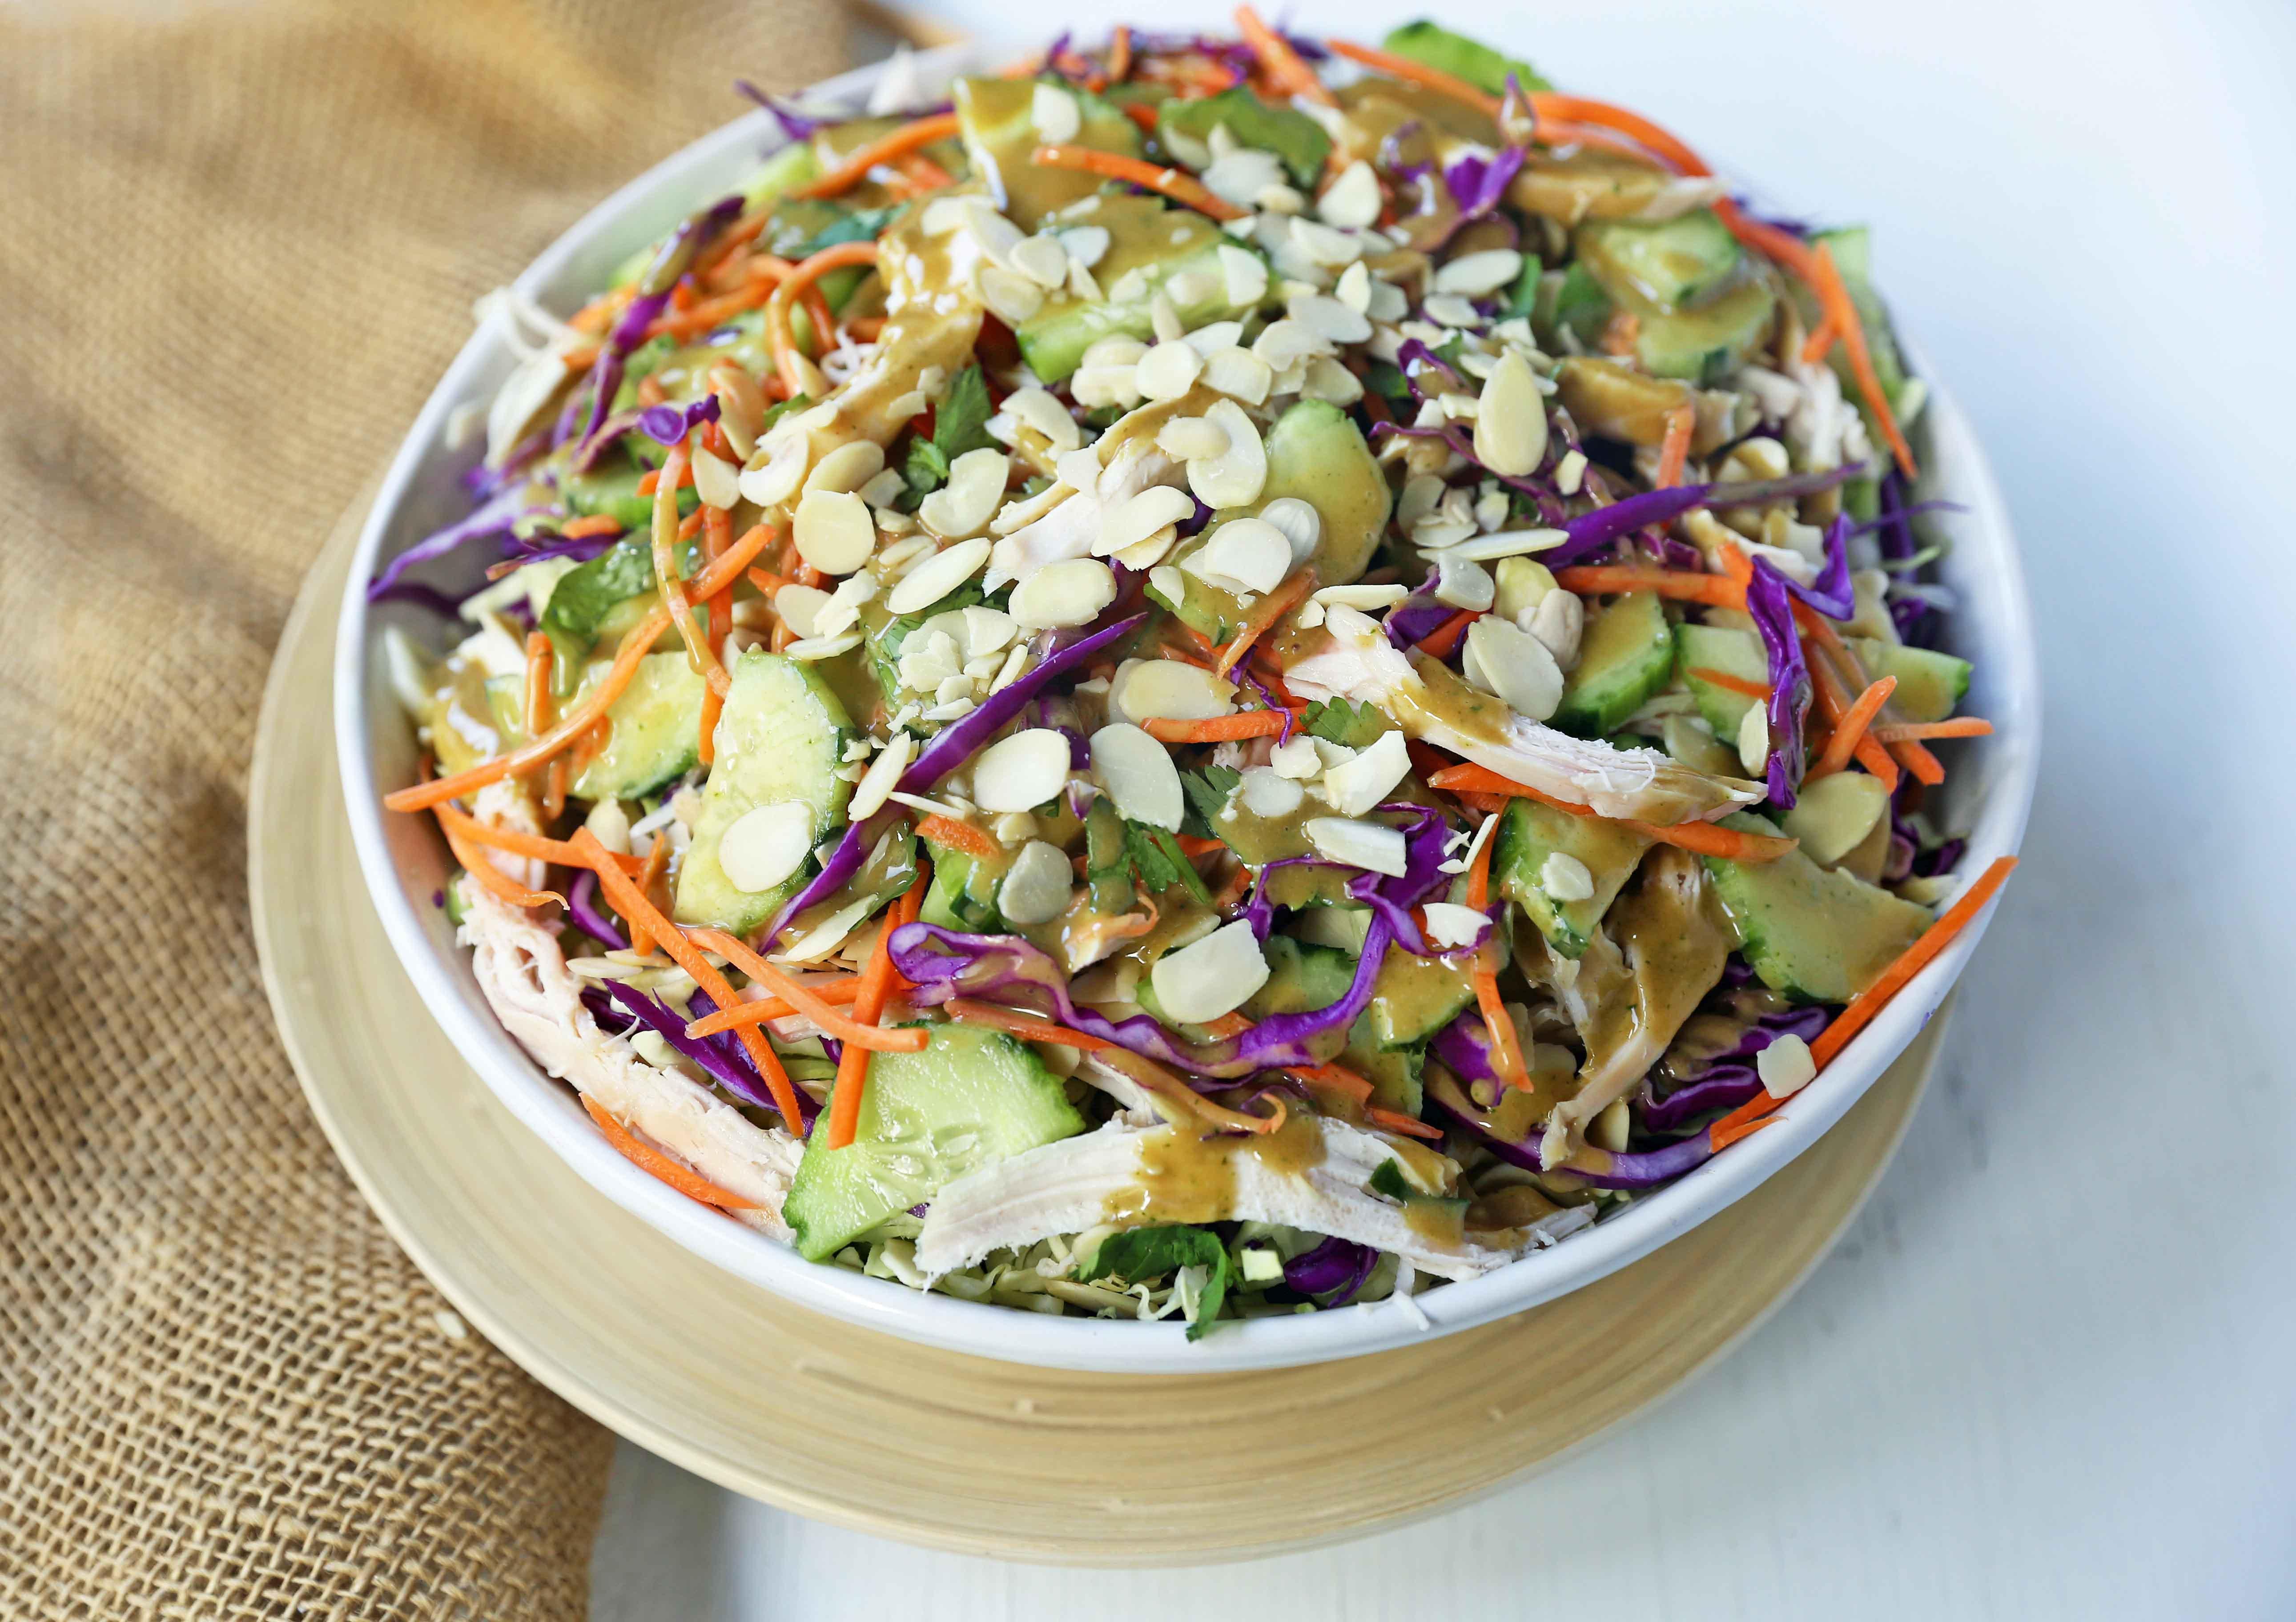 Thai Chicken Salad with Peanut Dressing. Crunchy Thai salad with cabbage, carrots, cucumber, slivered almonds, tender chicken in a homemade peanut dressing. A flavorful Chinese Chicken Salad. www.modernhoney.com #asiansalad #chickensalad #thaichickensalad #chinesechickensalad